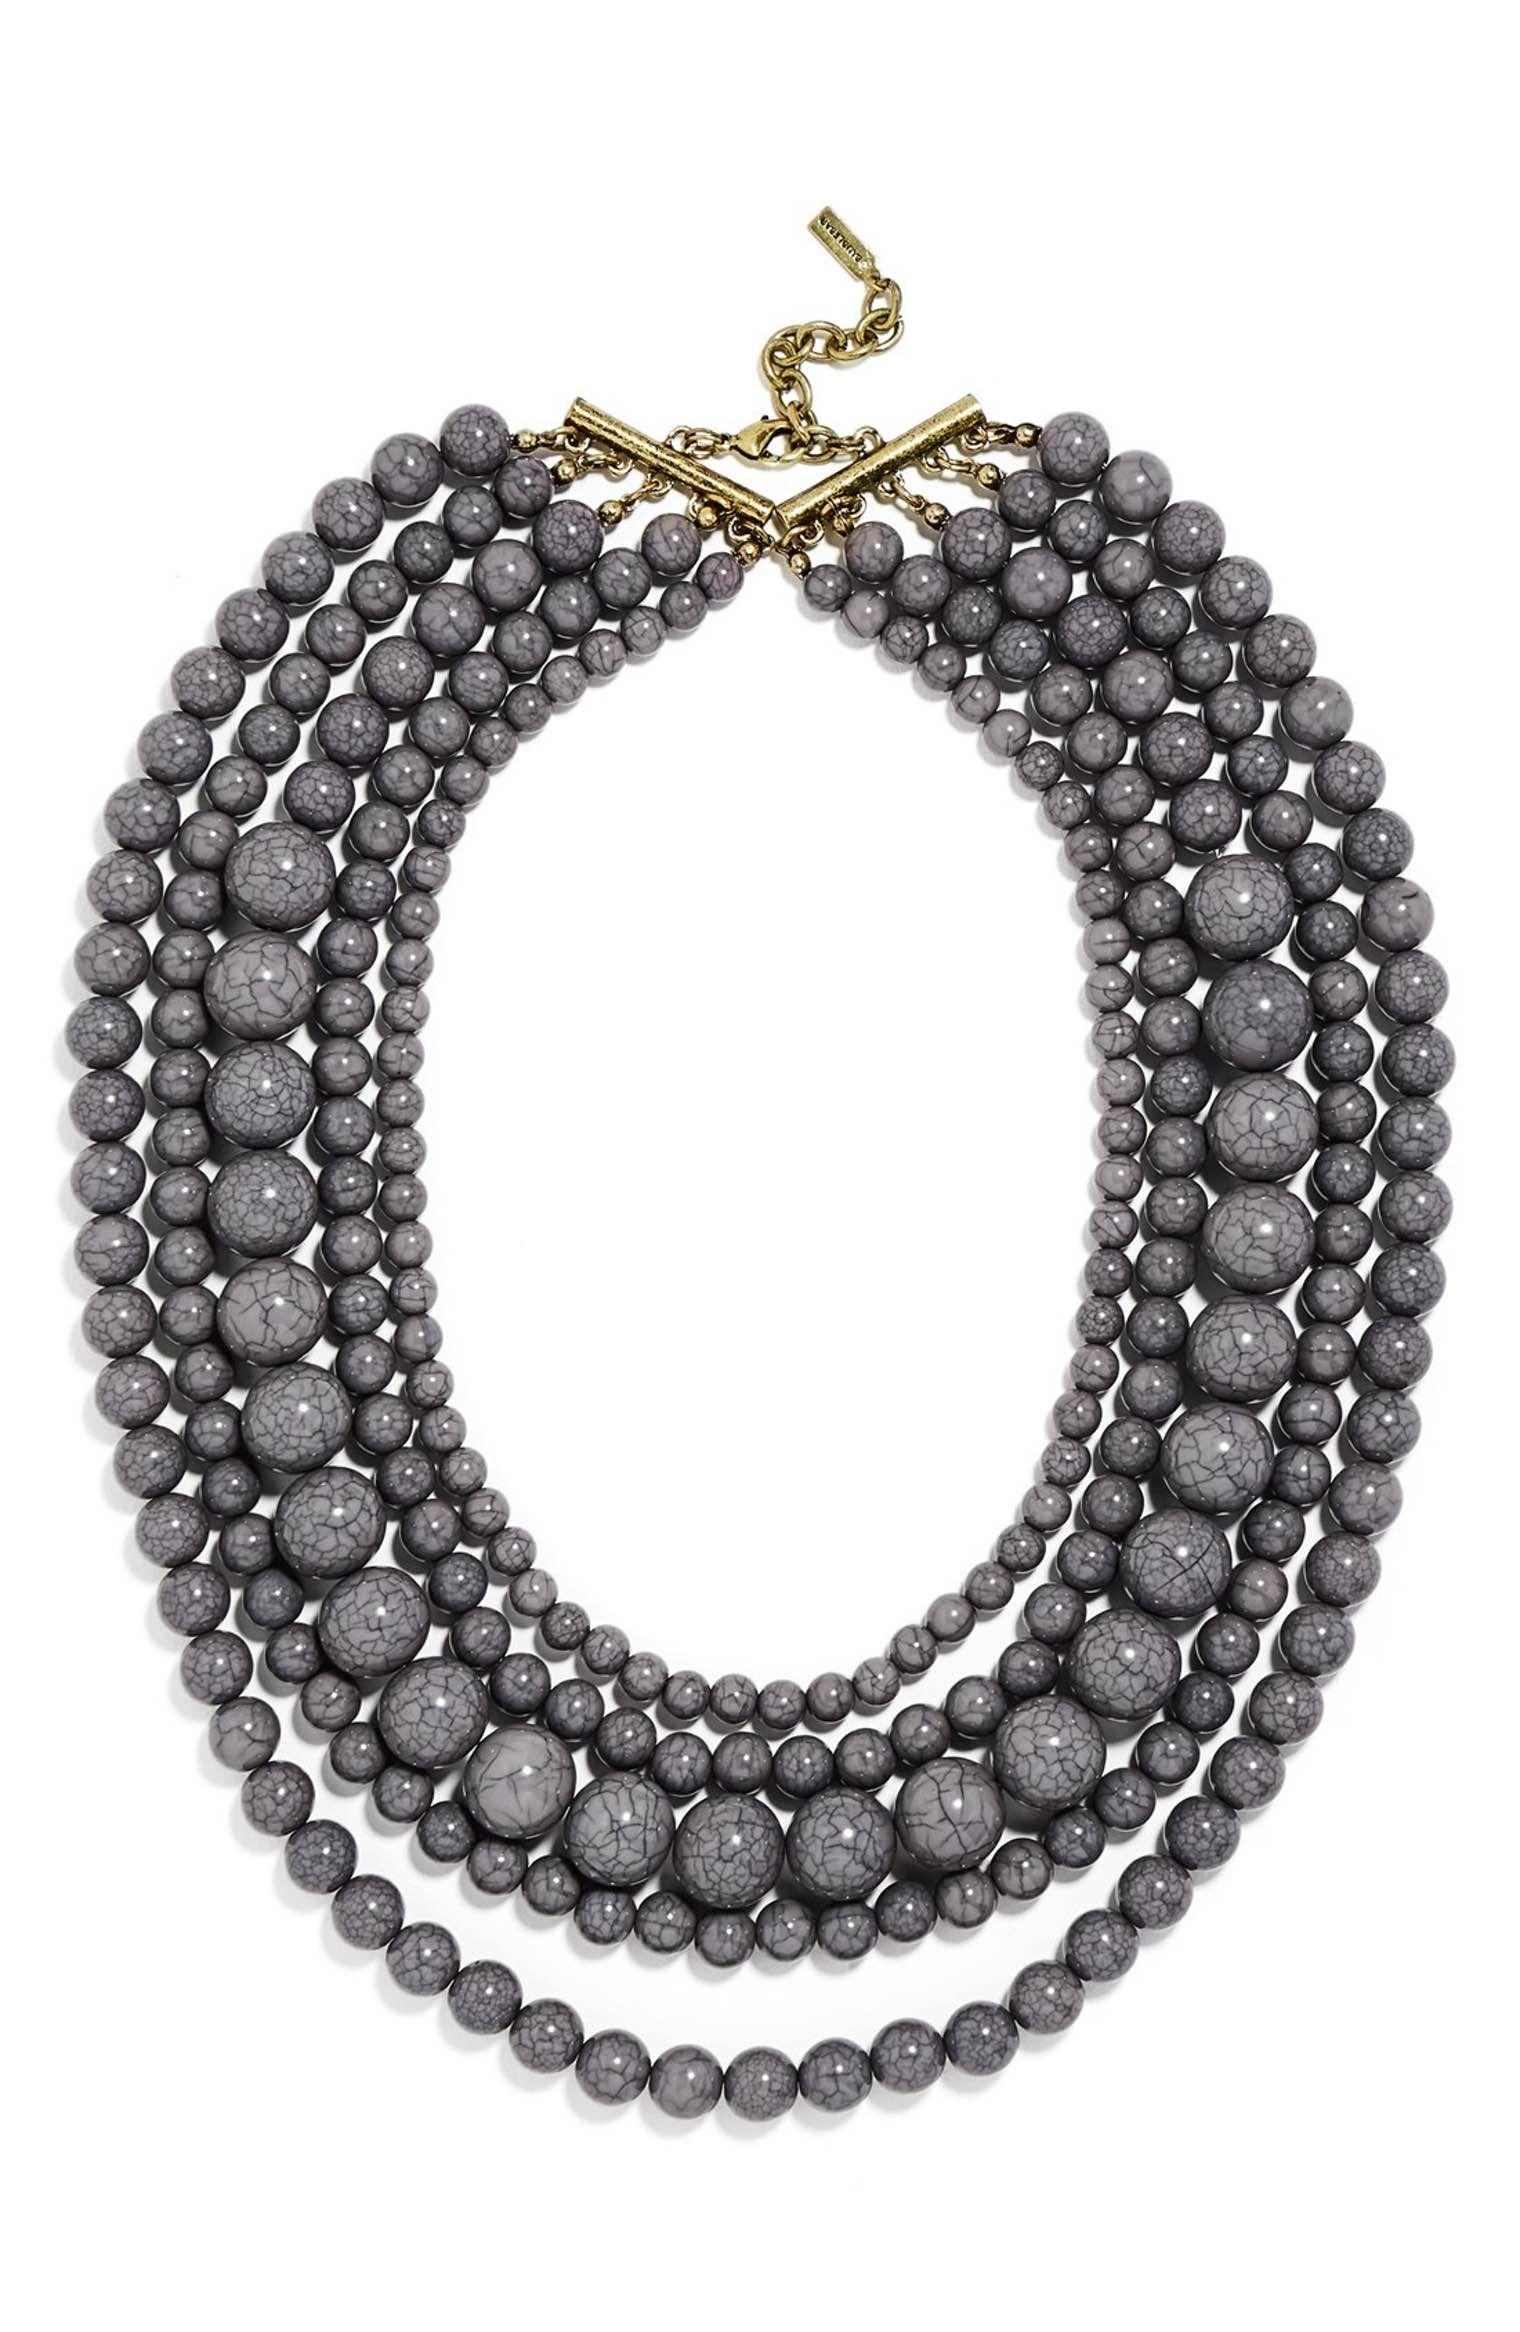 Main Image - BaubleBar 'Globe' Multistrand Beaded Necklace